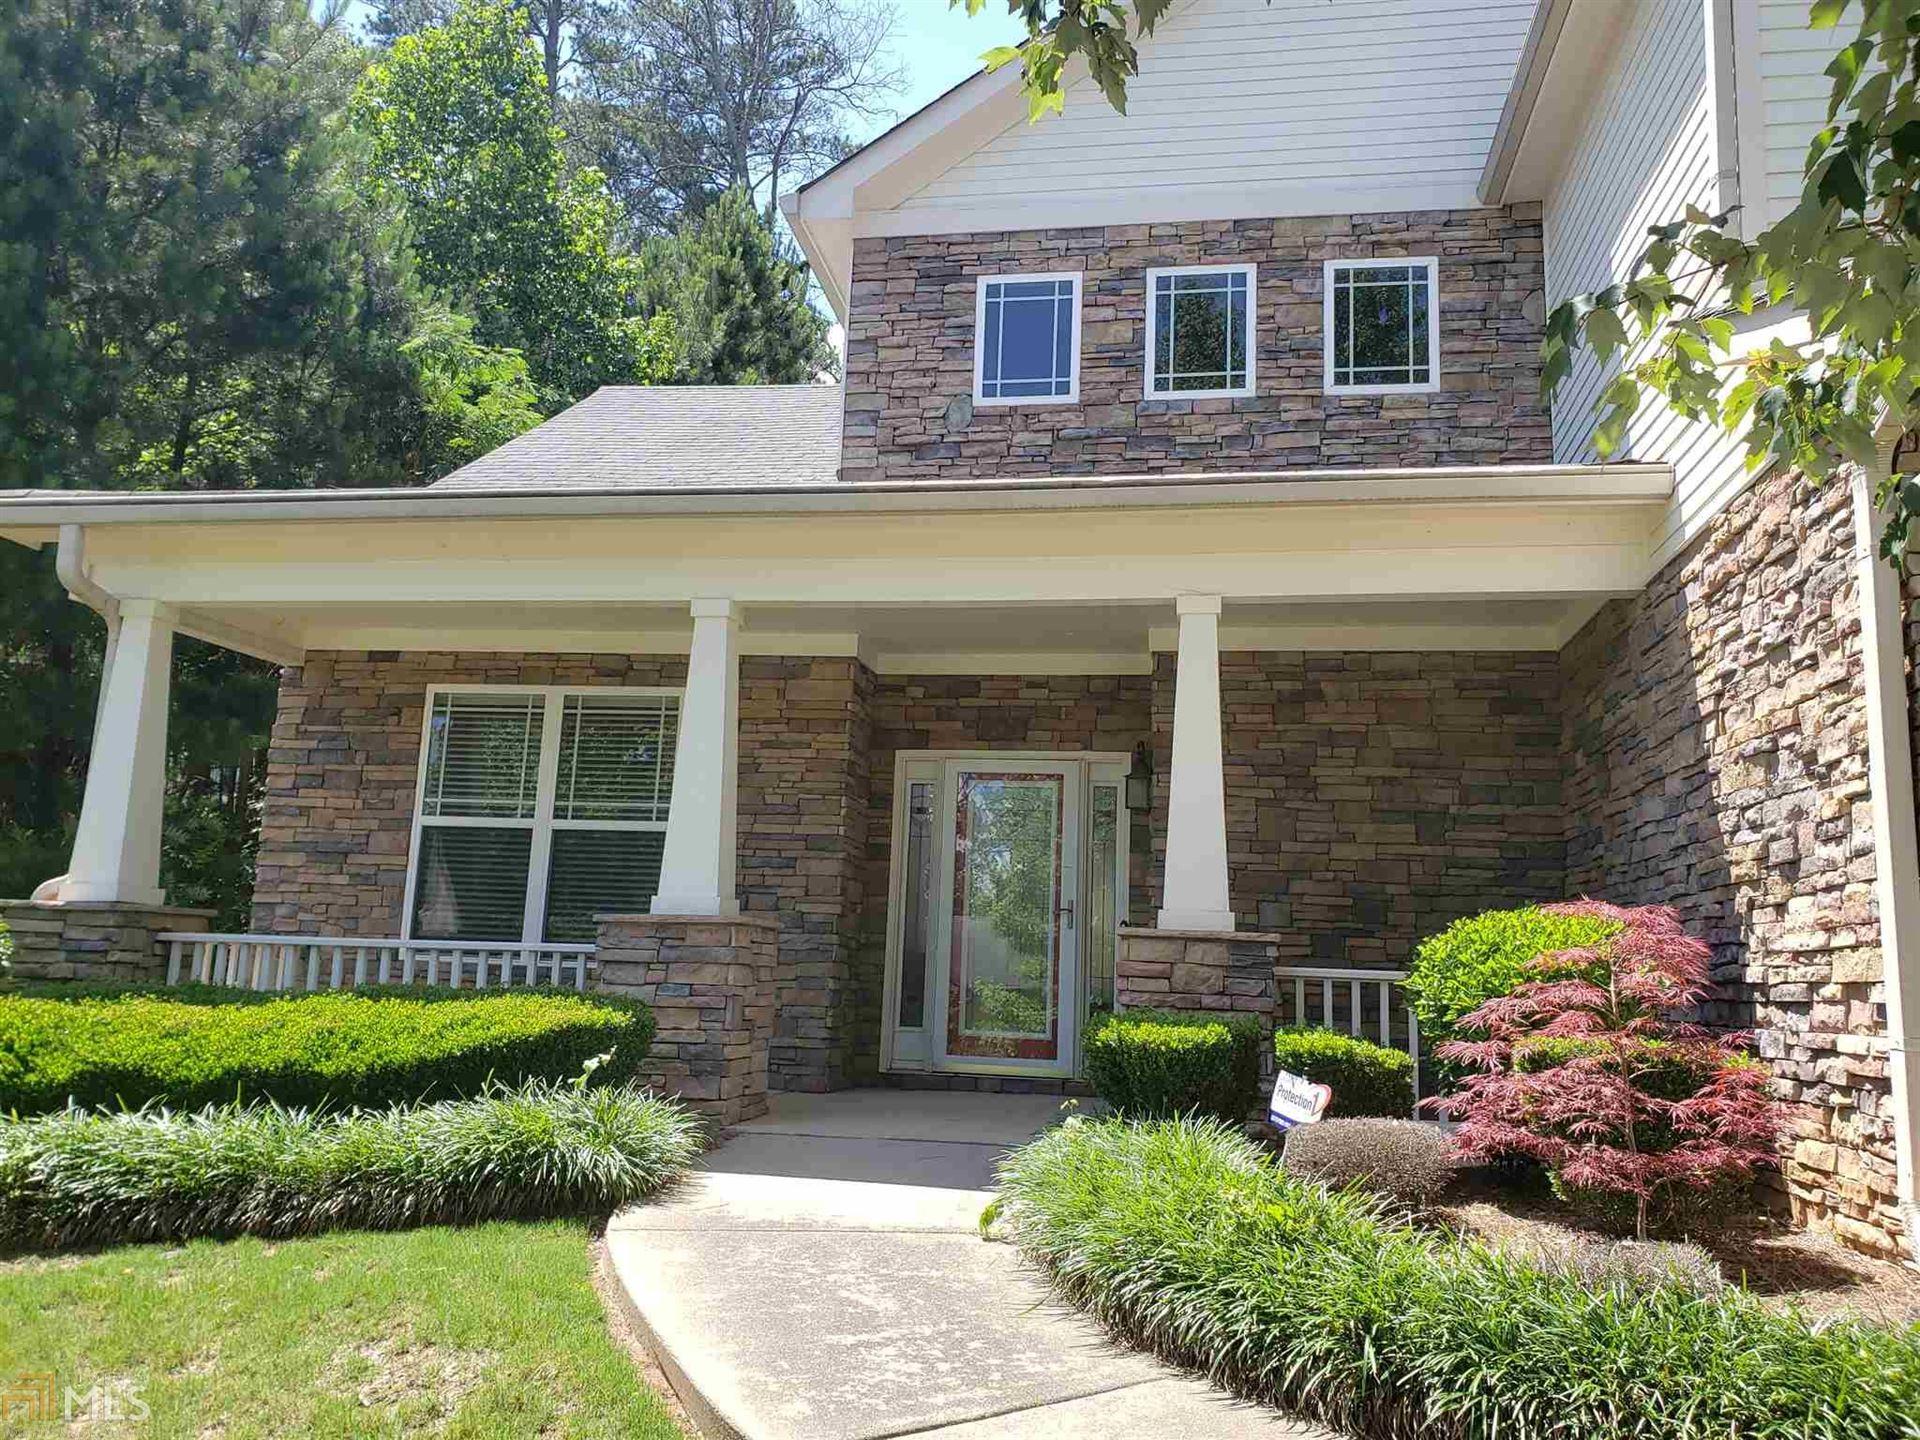 3431 Village Park Ln, Atlanta, GA 30331 - MLS#: 8674769